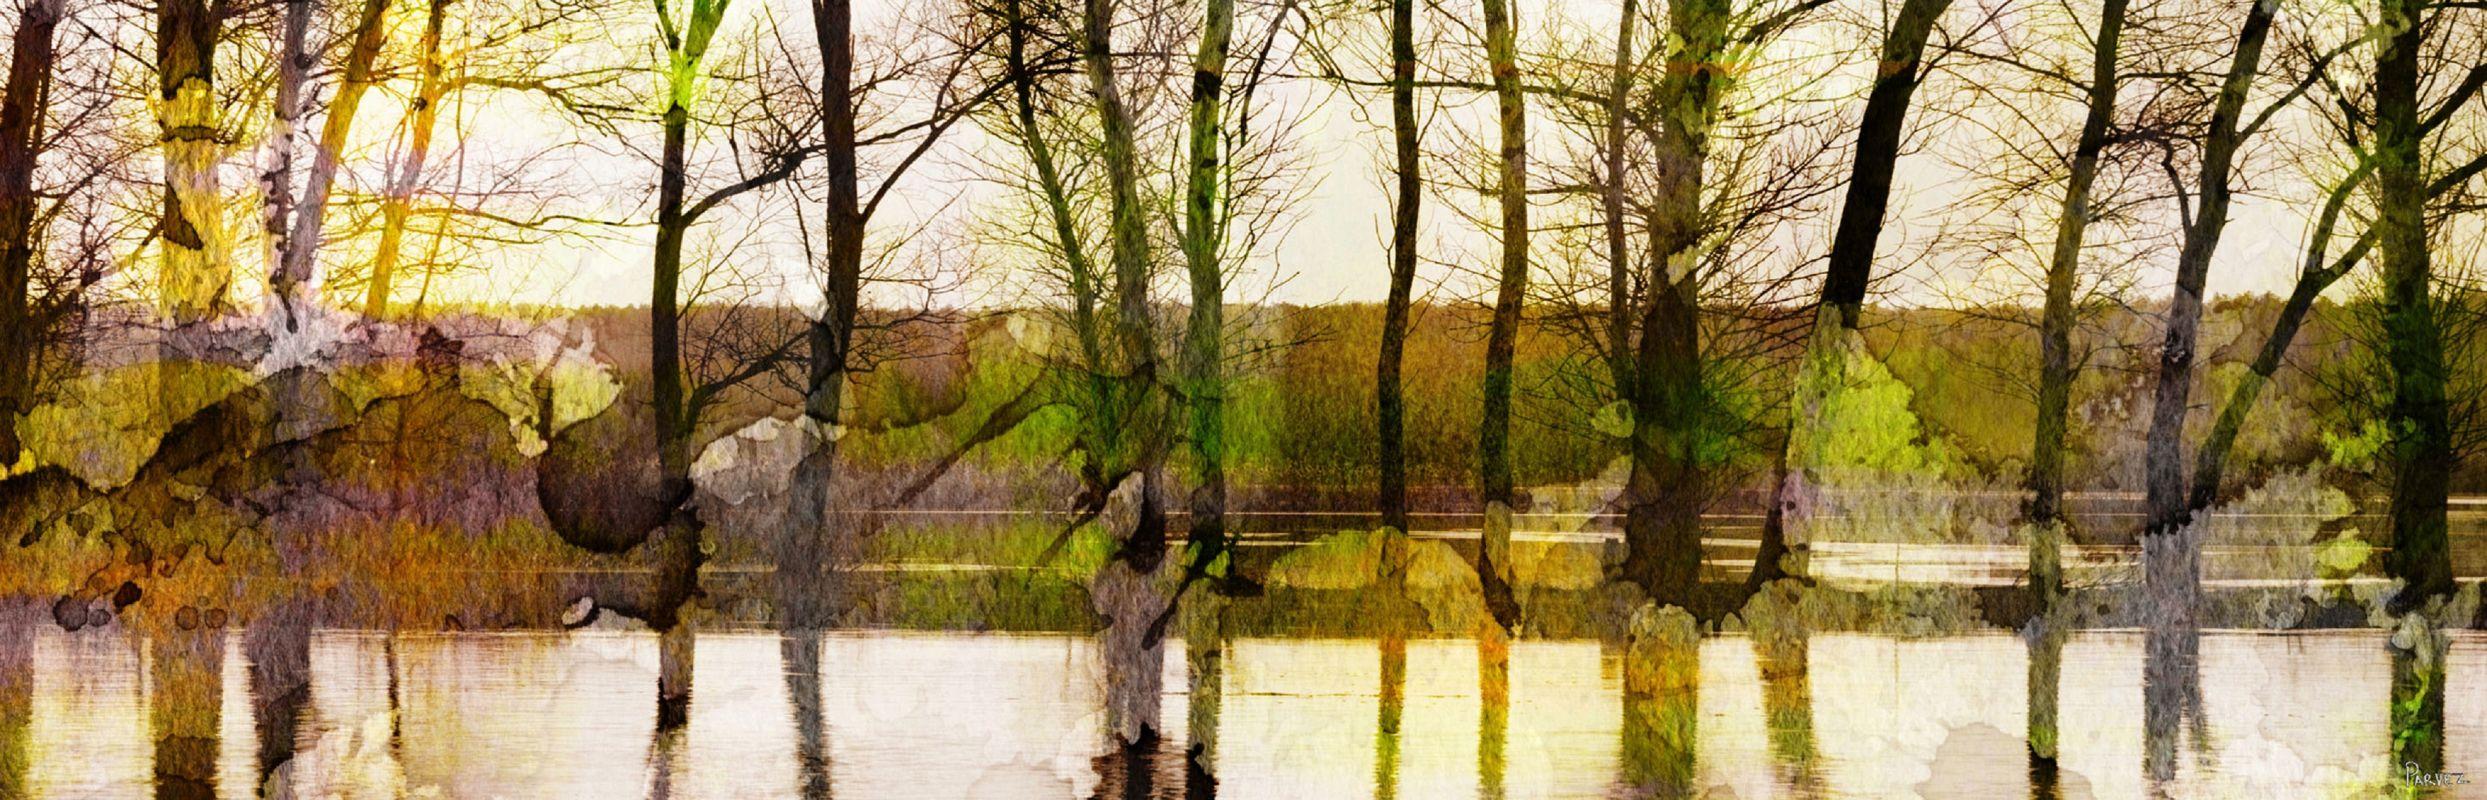 Parvez Taj Lake Trees Art Print on Premium Canvas 20 x 60 Home Decor